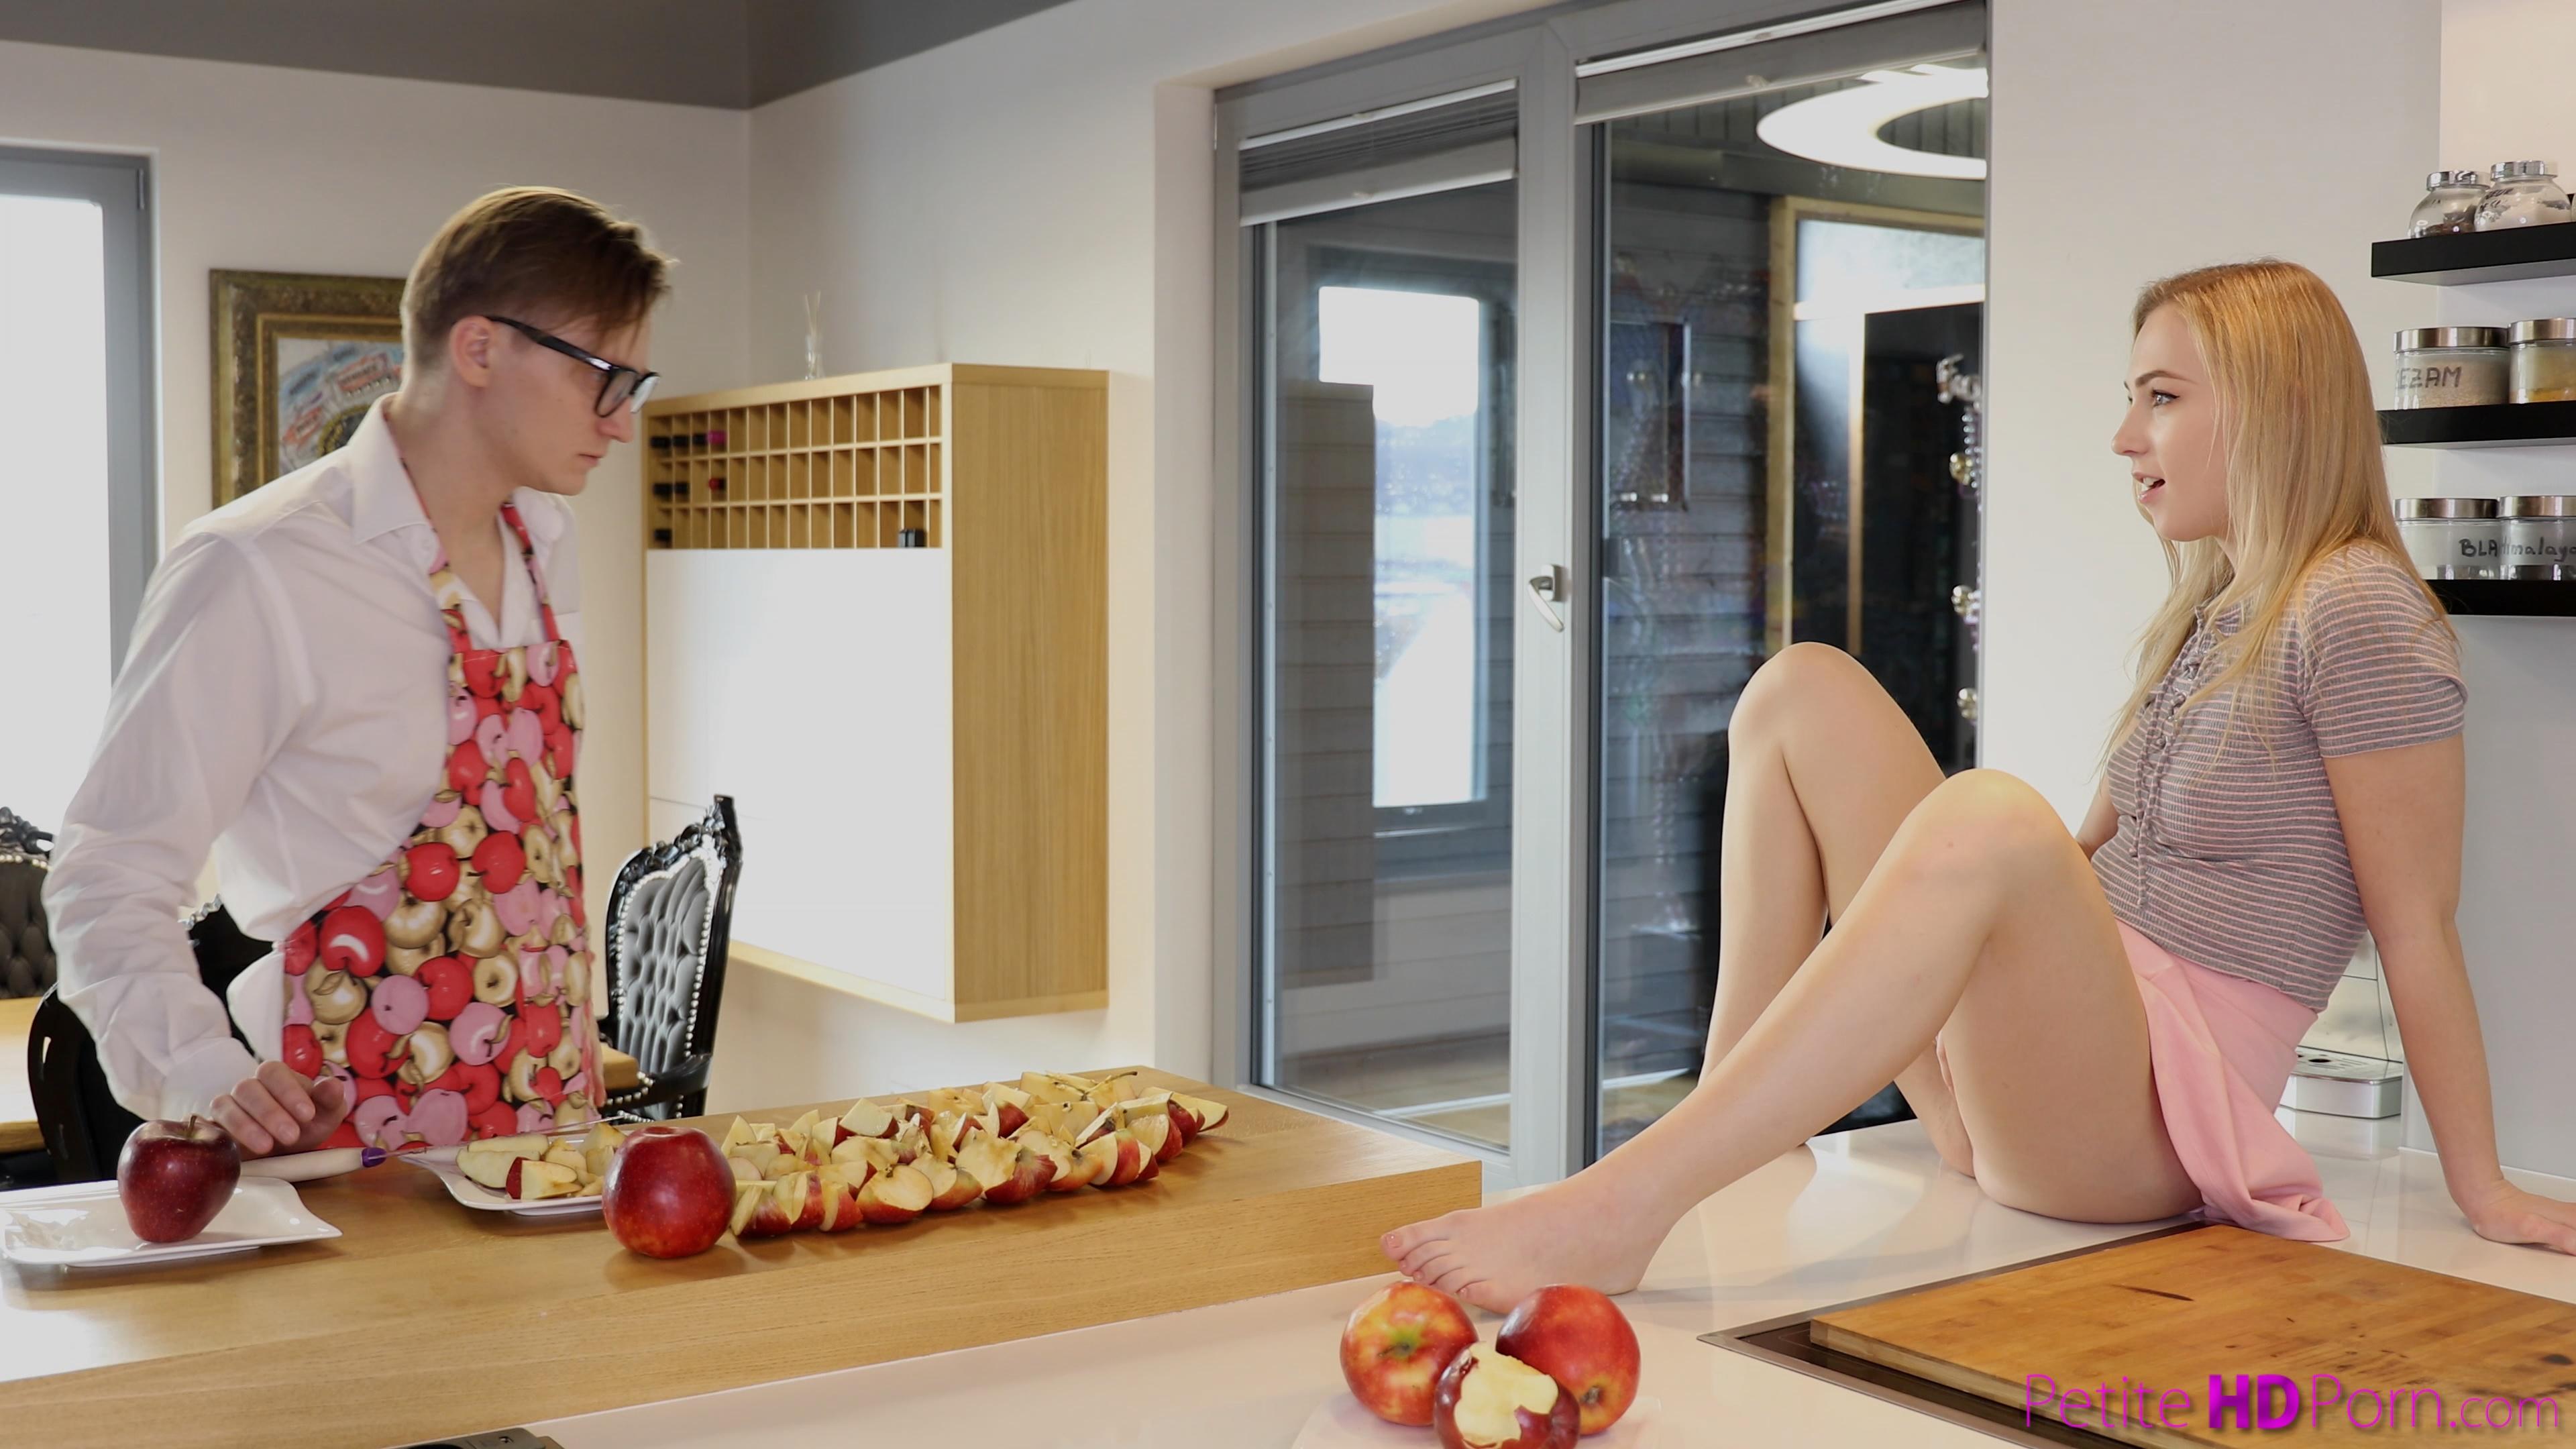 Apple Pie Porn petite hd porn - step sisters warm apple pie - s20:e4